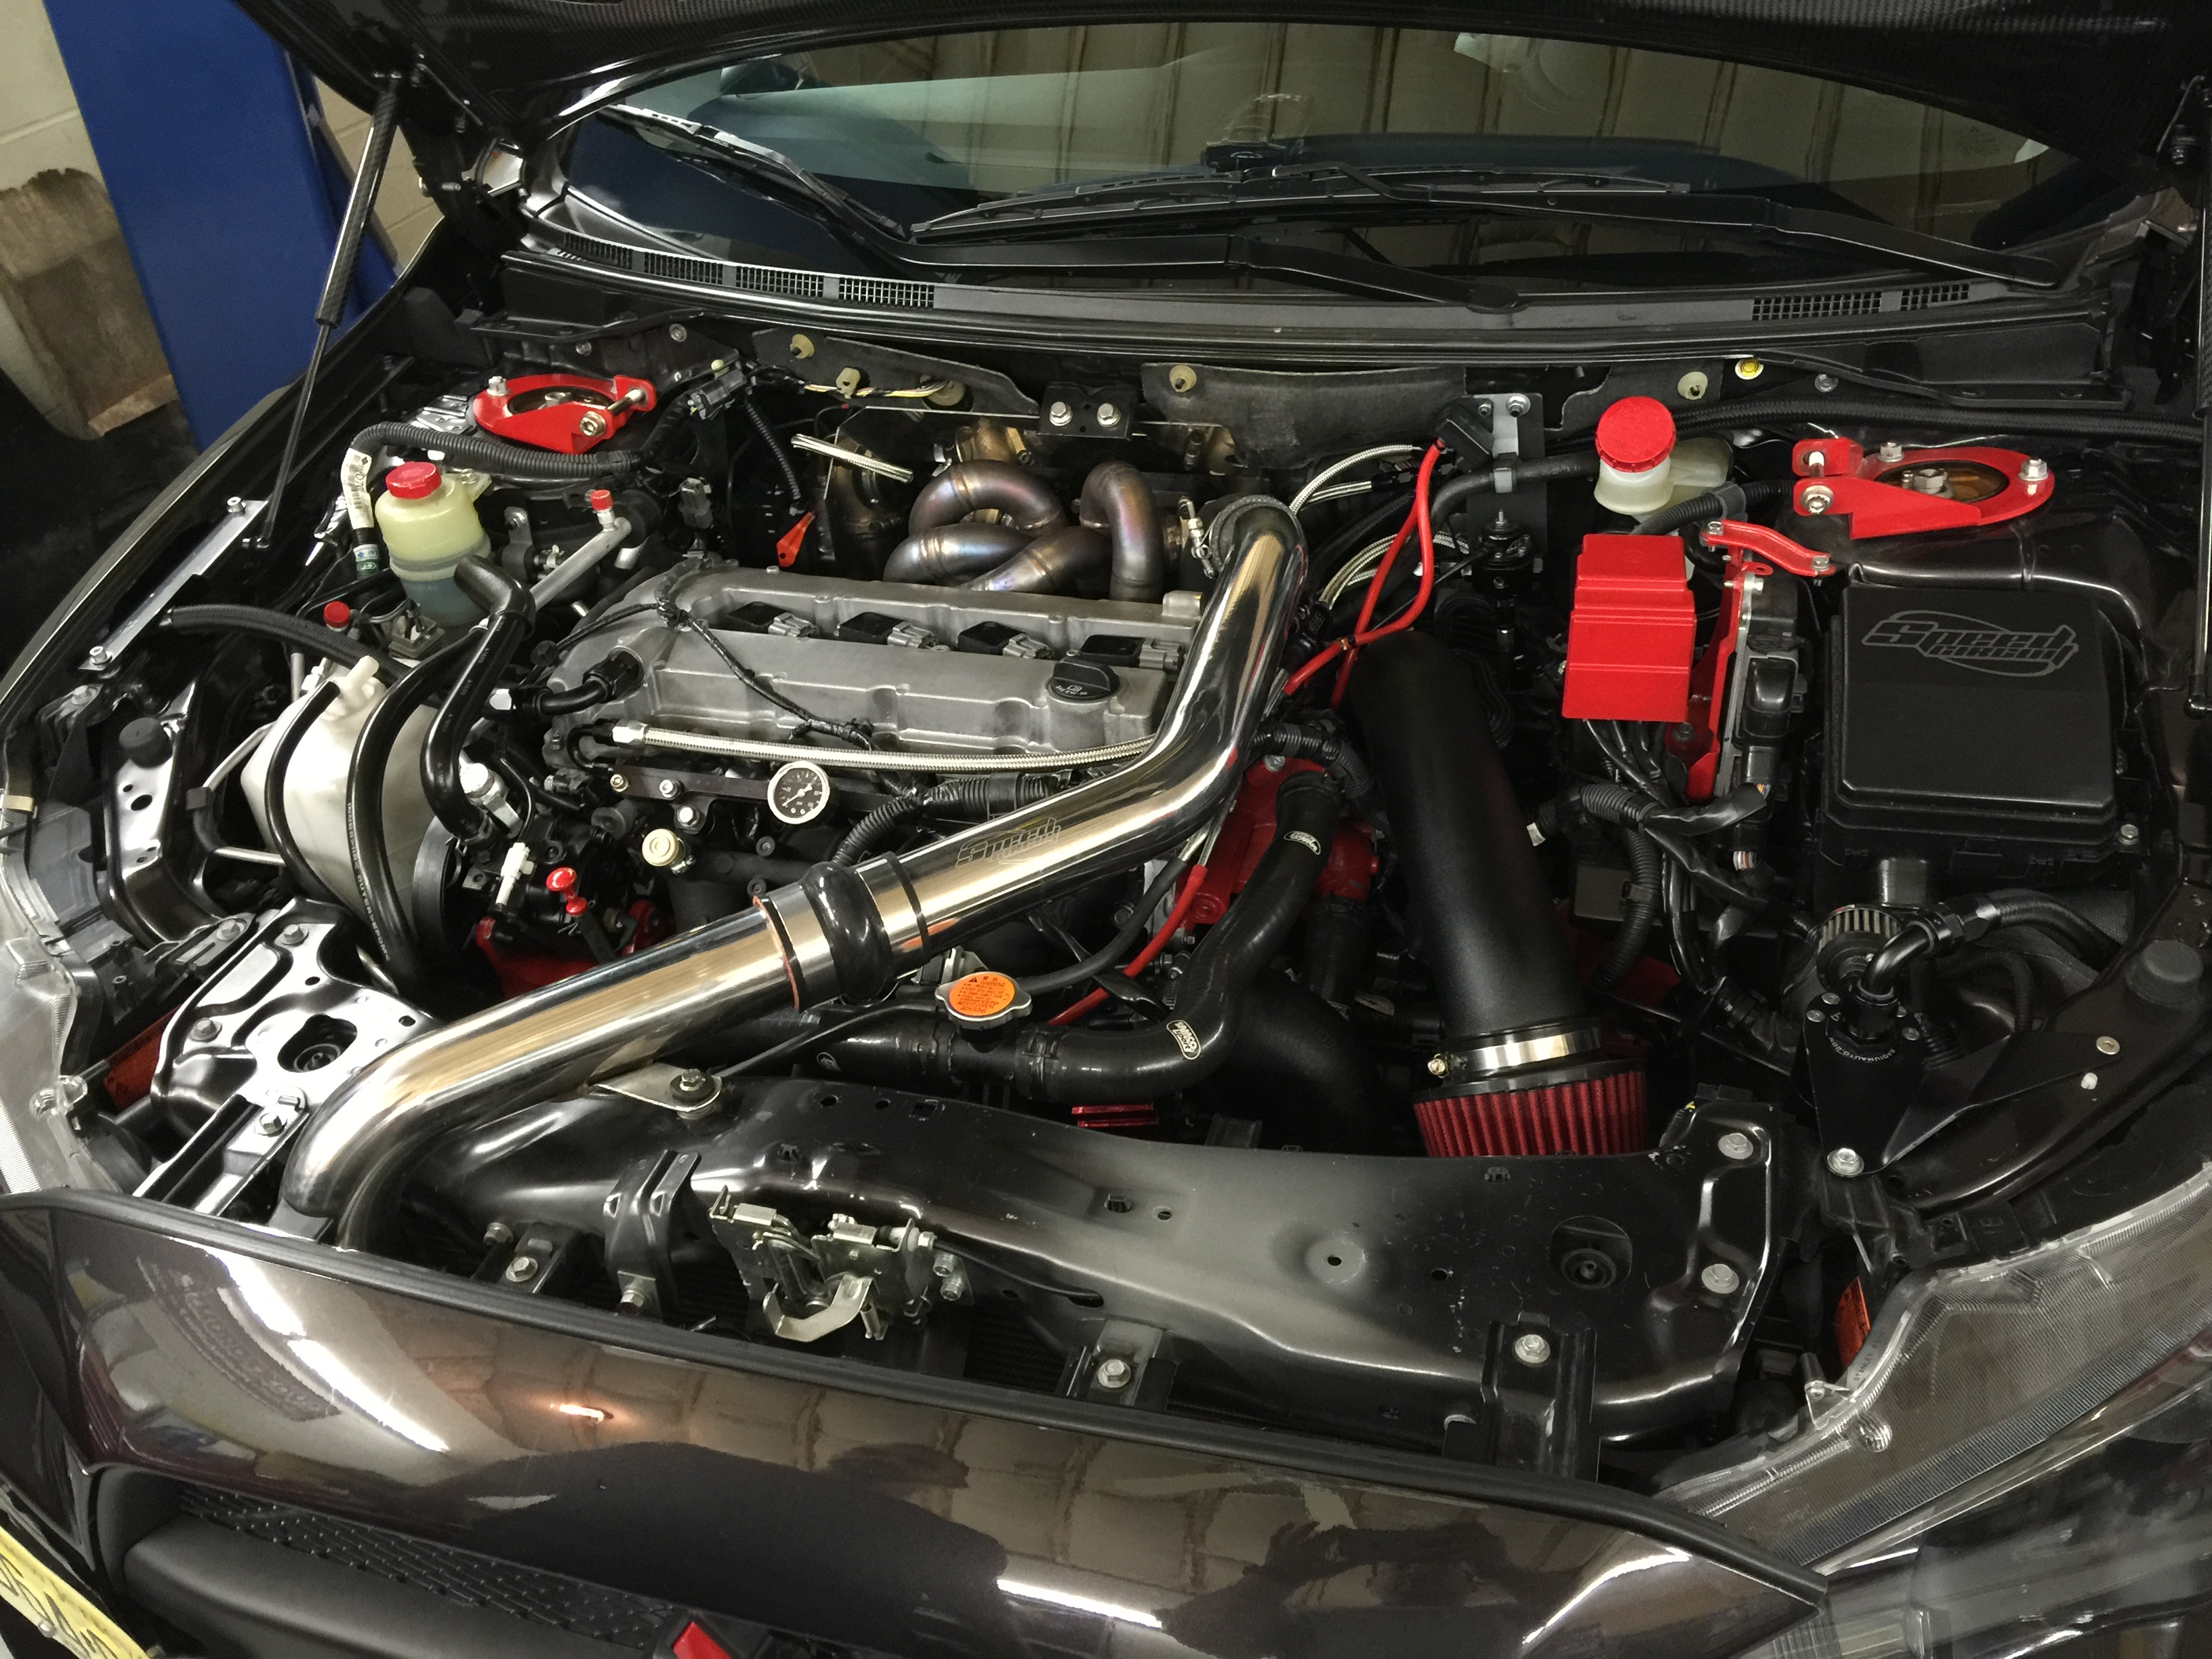 600 horsepower Evo X motor wipe down